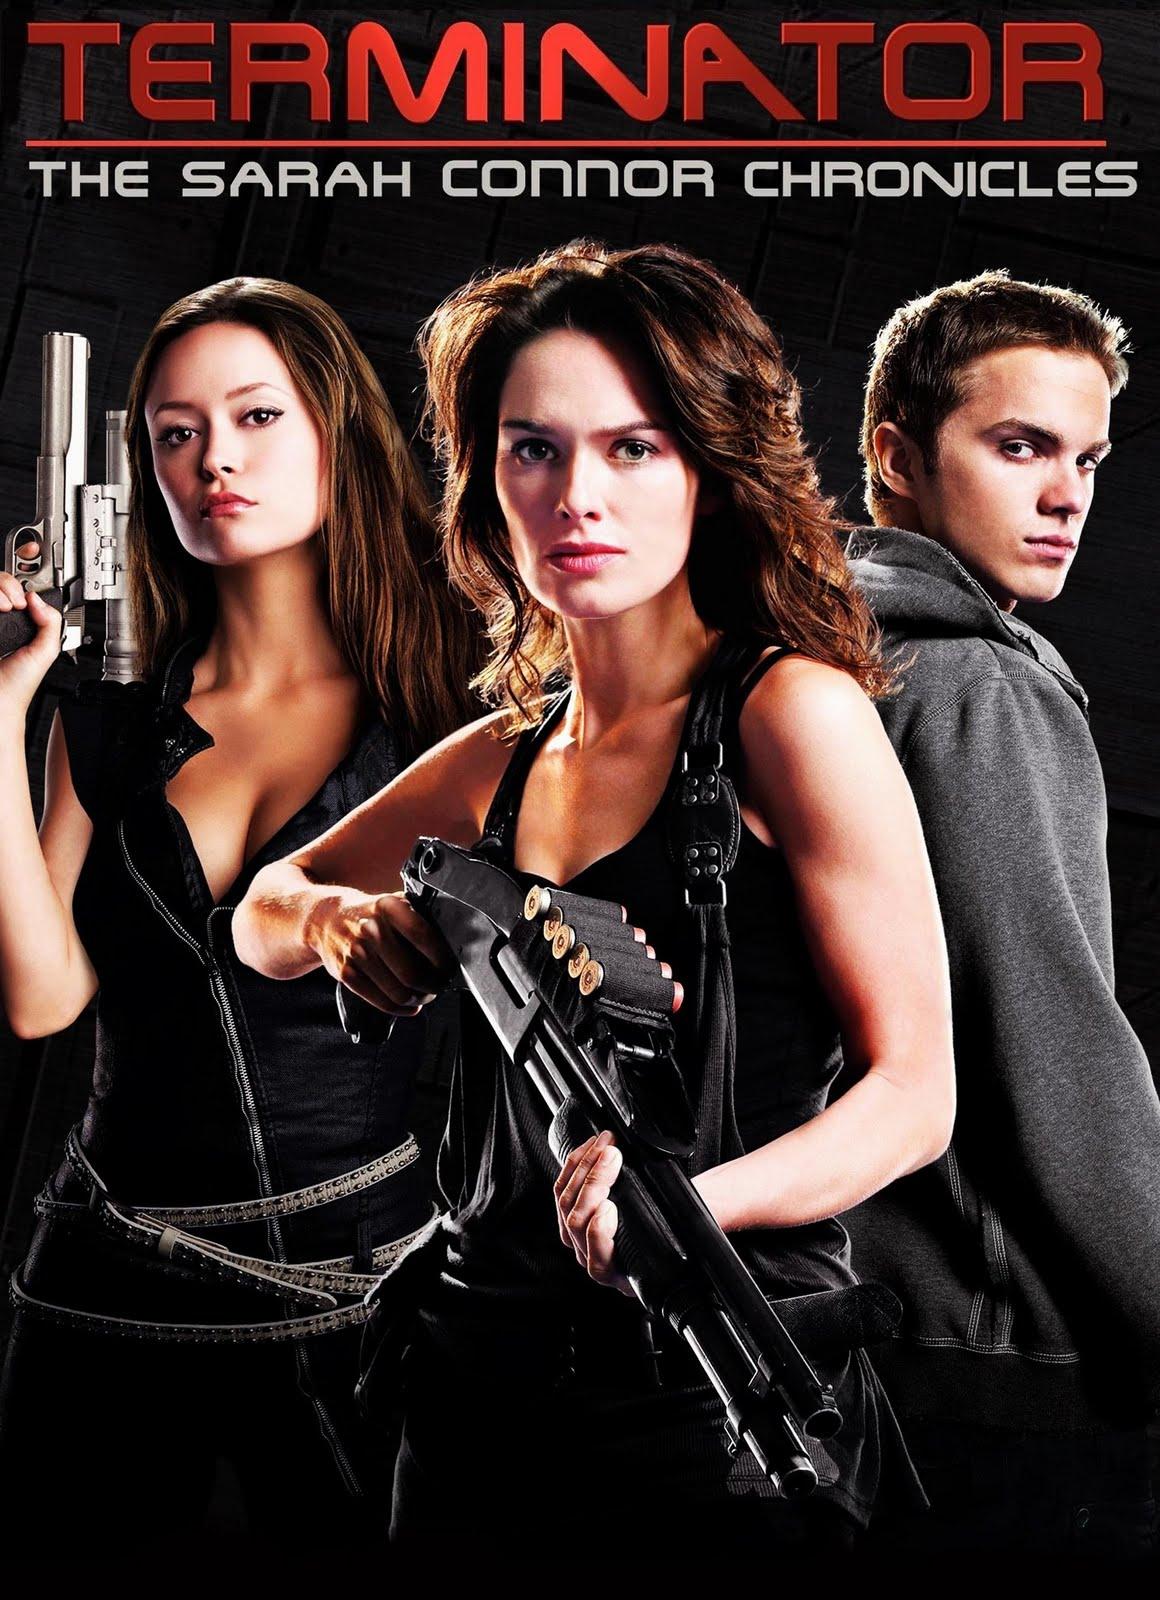 http://4.bp.blogspot.com/-oGzLl8q47Us/TqRgv806t6I/AAAAAAABkXg/eGvg_SF9mGA/s1600/Terminator%2B-%2BThe%2BSarah%2BConnor%2BChronicles%2BDVD%2B01.jpg